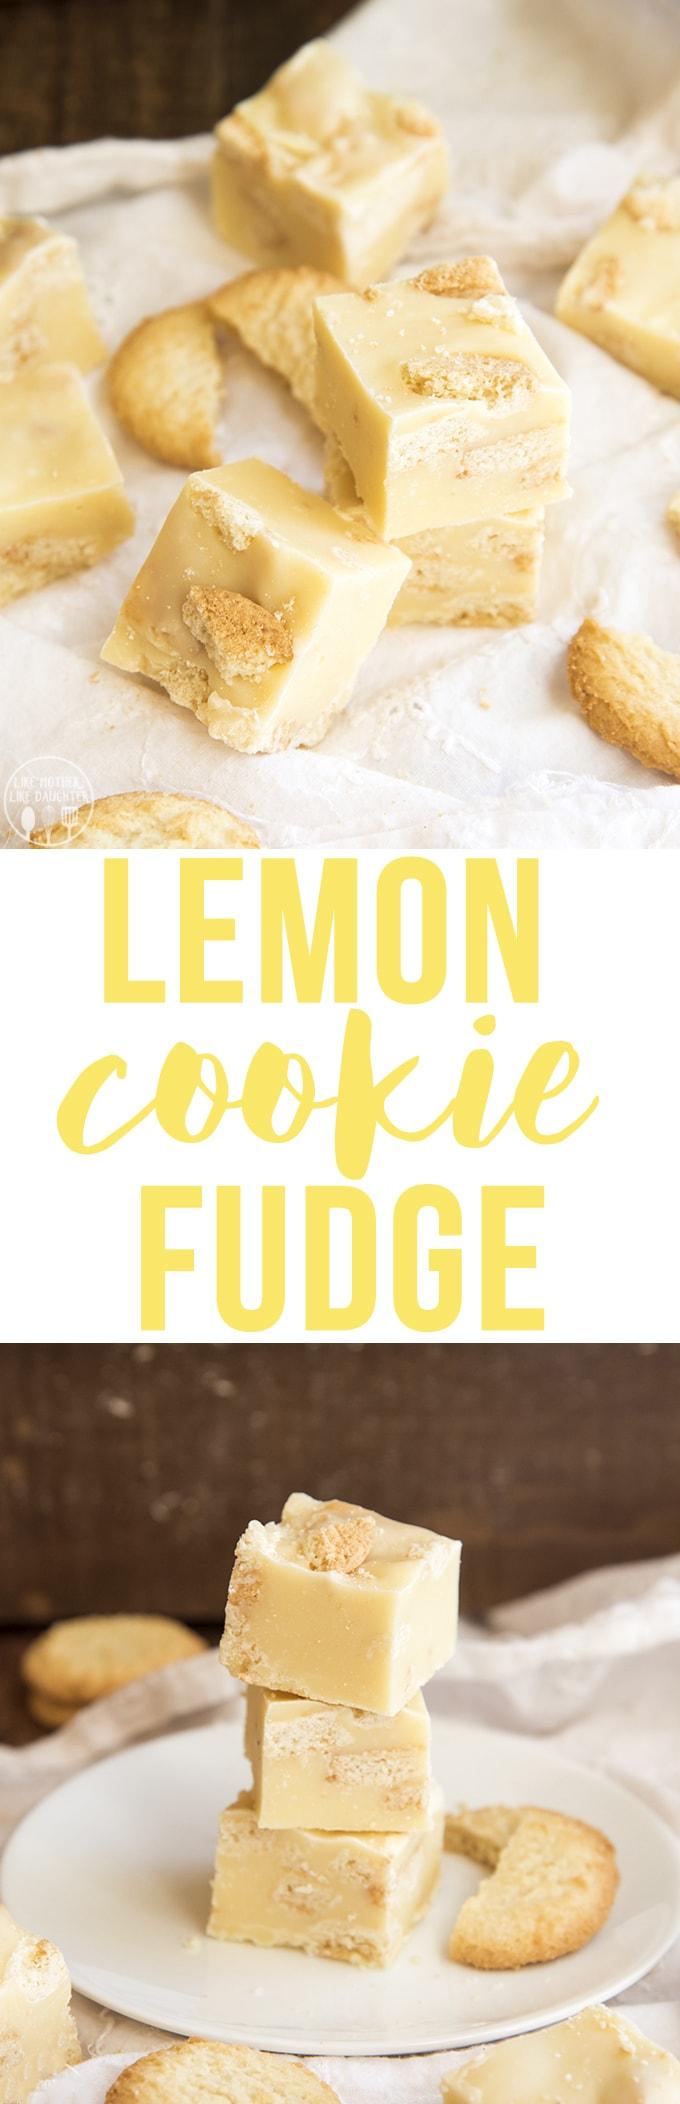 Lemon Cookie Fudge is a tangy microwavable lemon fudge, stuffed full of lemon cookies for a taste of sunshine all year long.